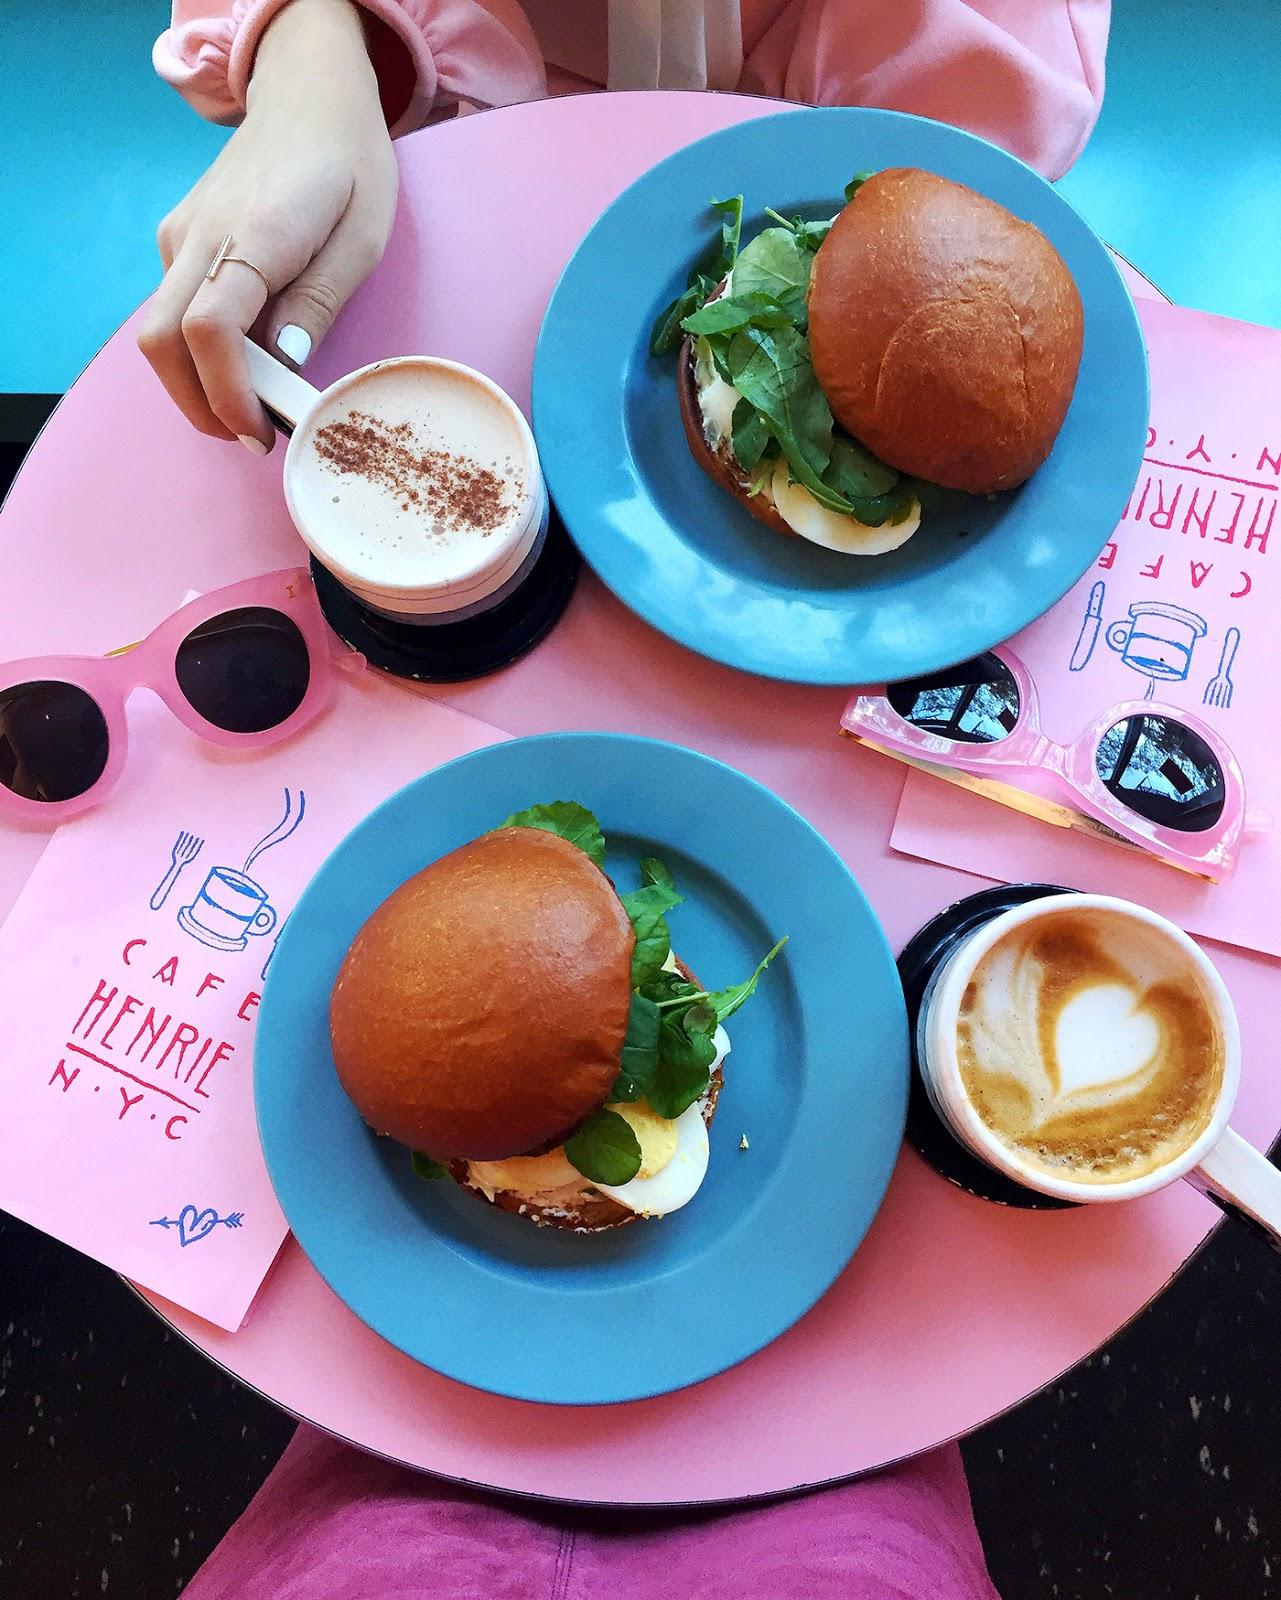 Breakfast at Cafe Henrie, New York City, Best Brunch